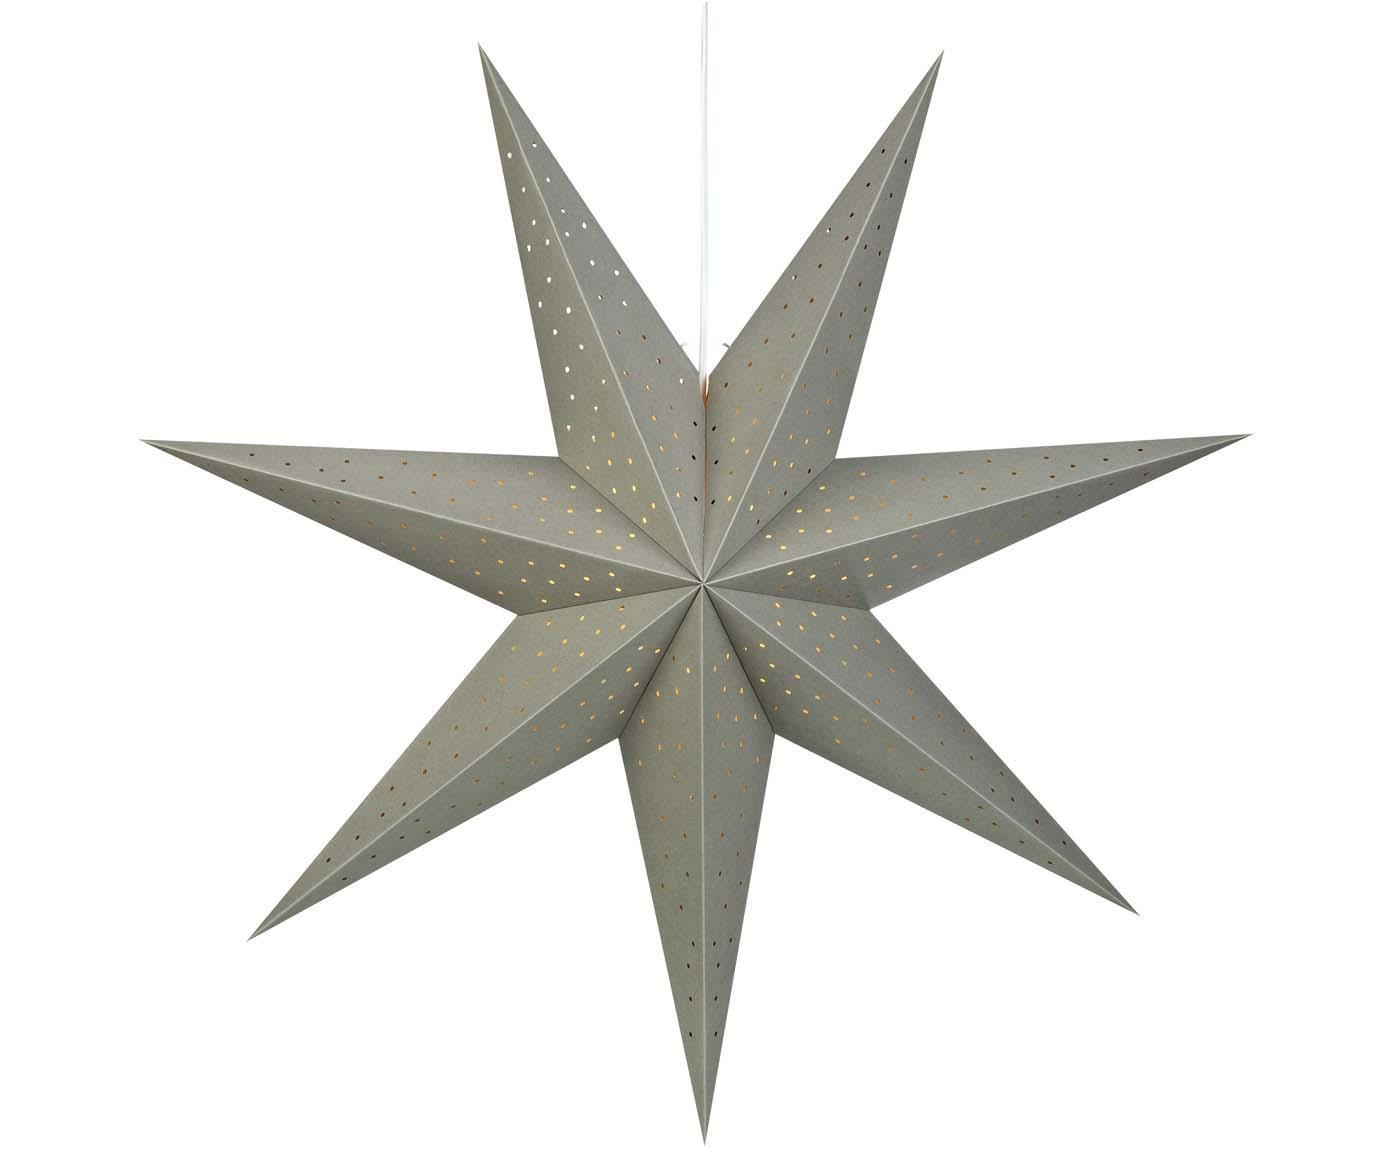 Weihnachtsstern Morris, Grau, Ø 75 cm